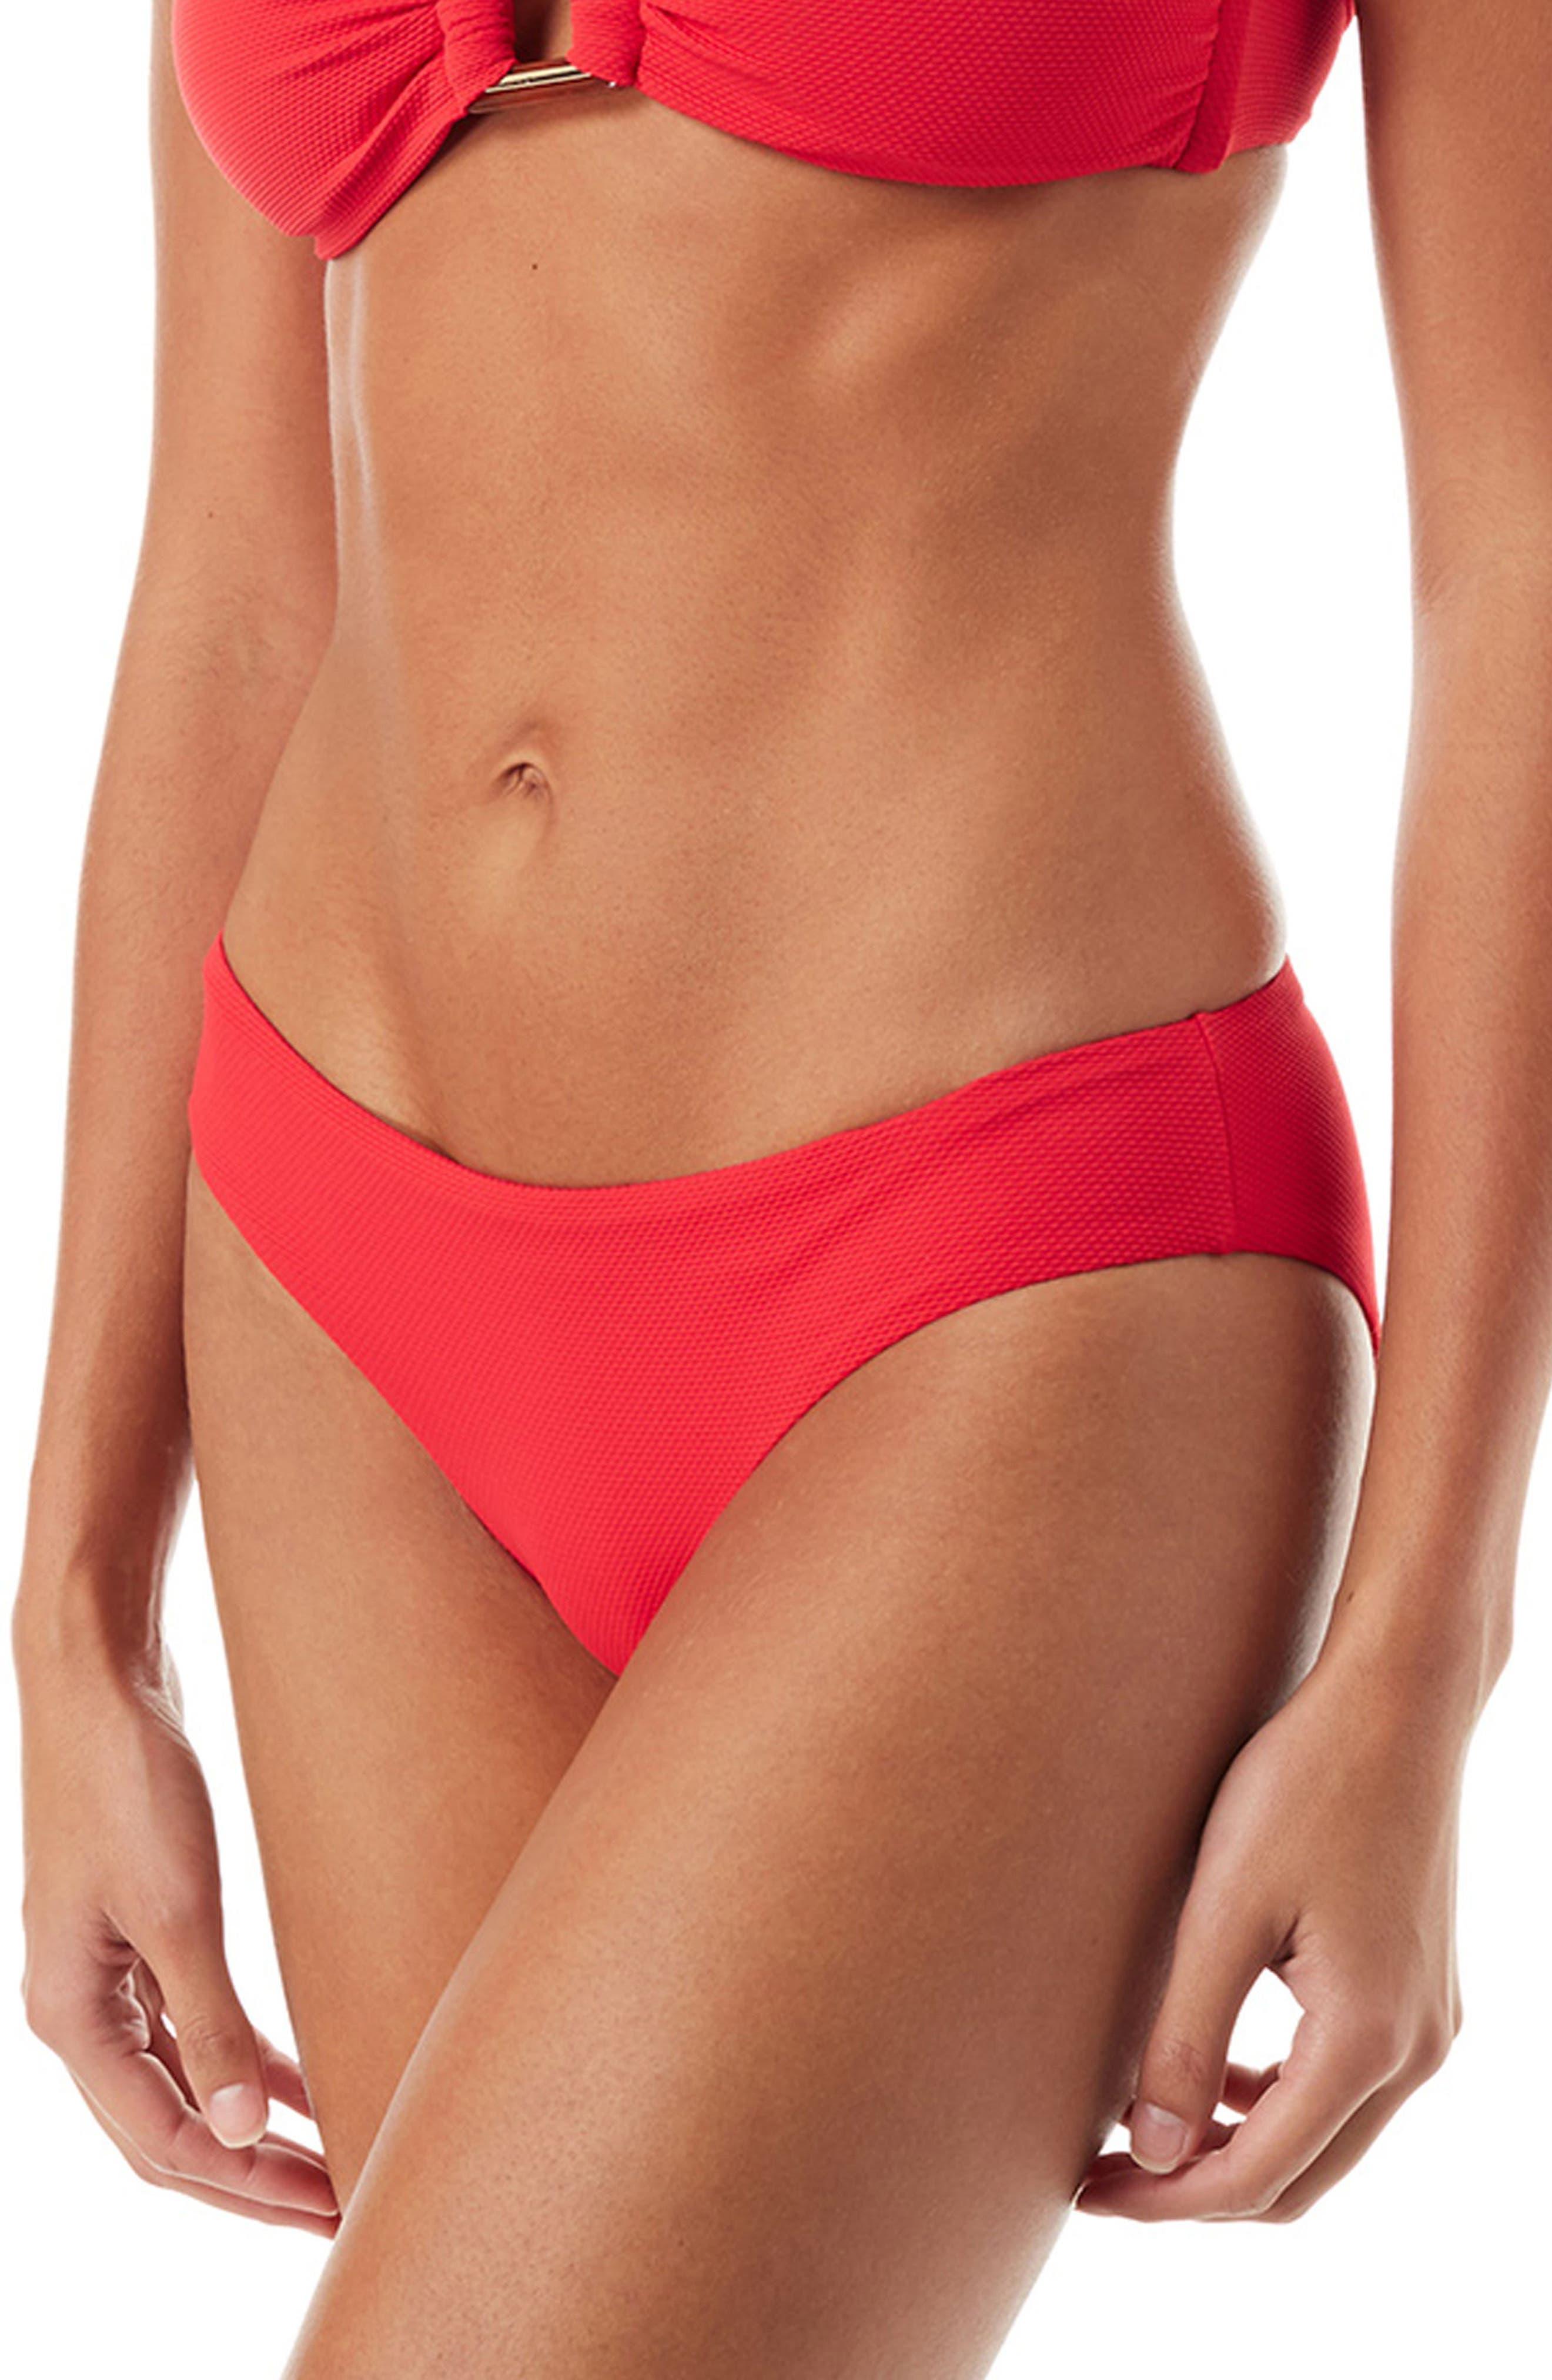 Angola Bikini Bottoms,                             Main thumbnail 1, color,                             Pique Red